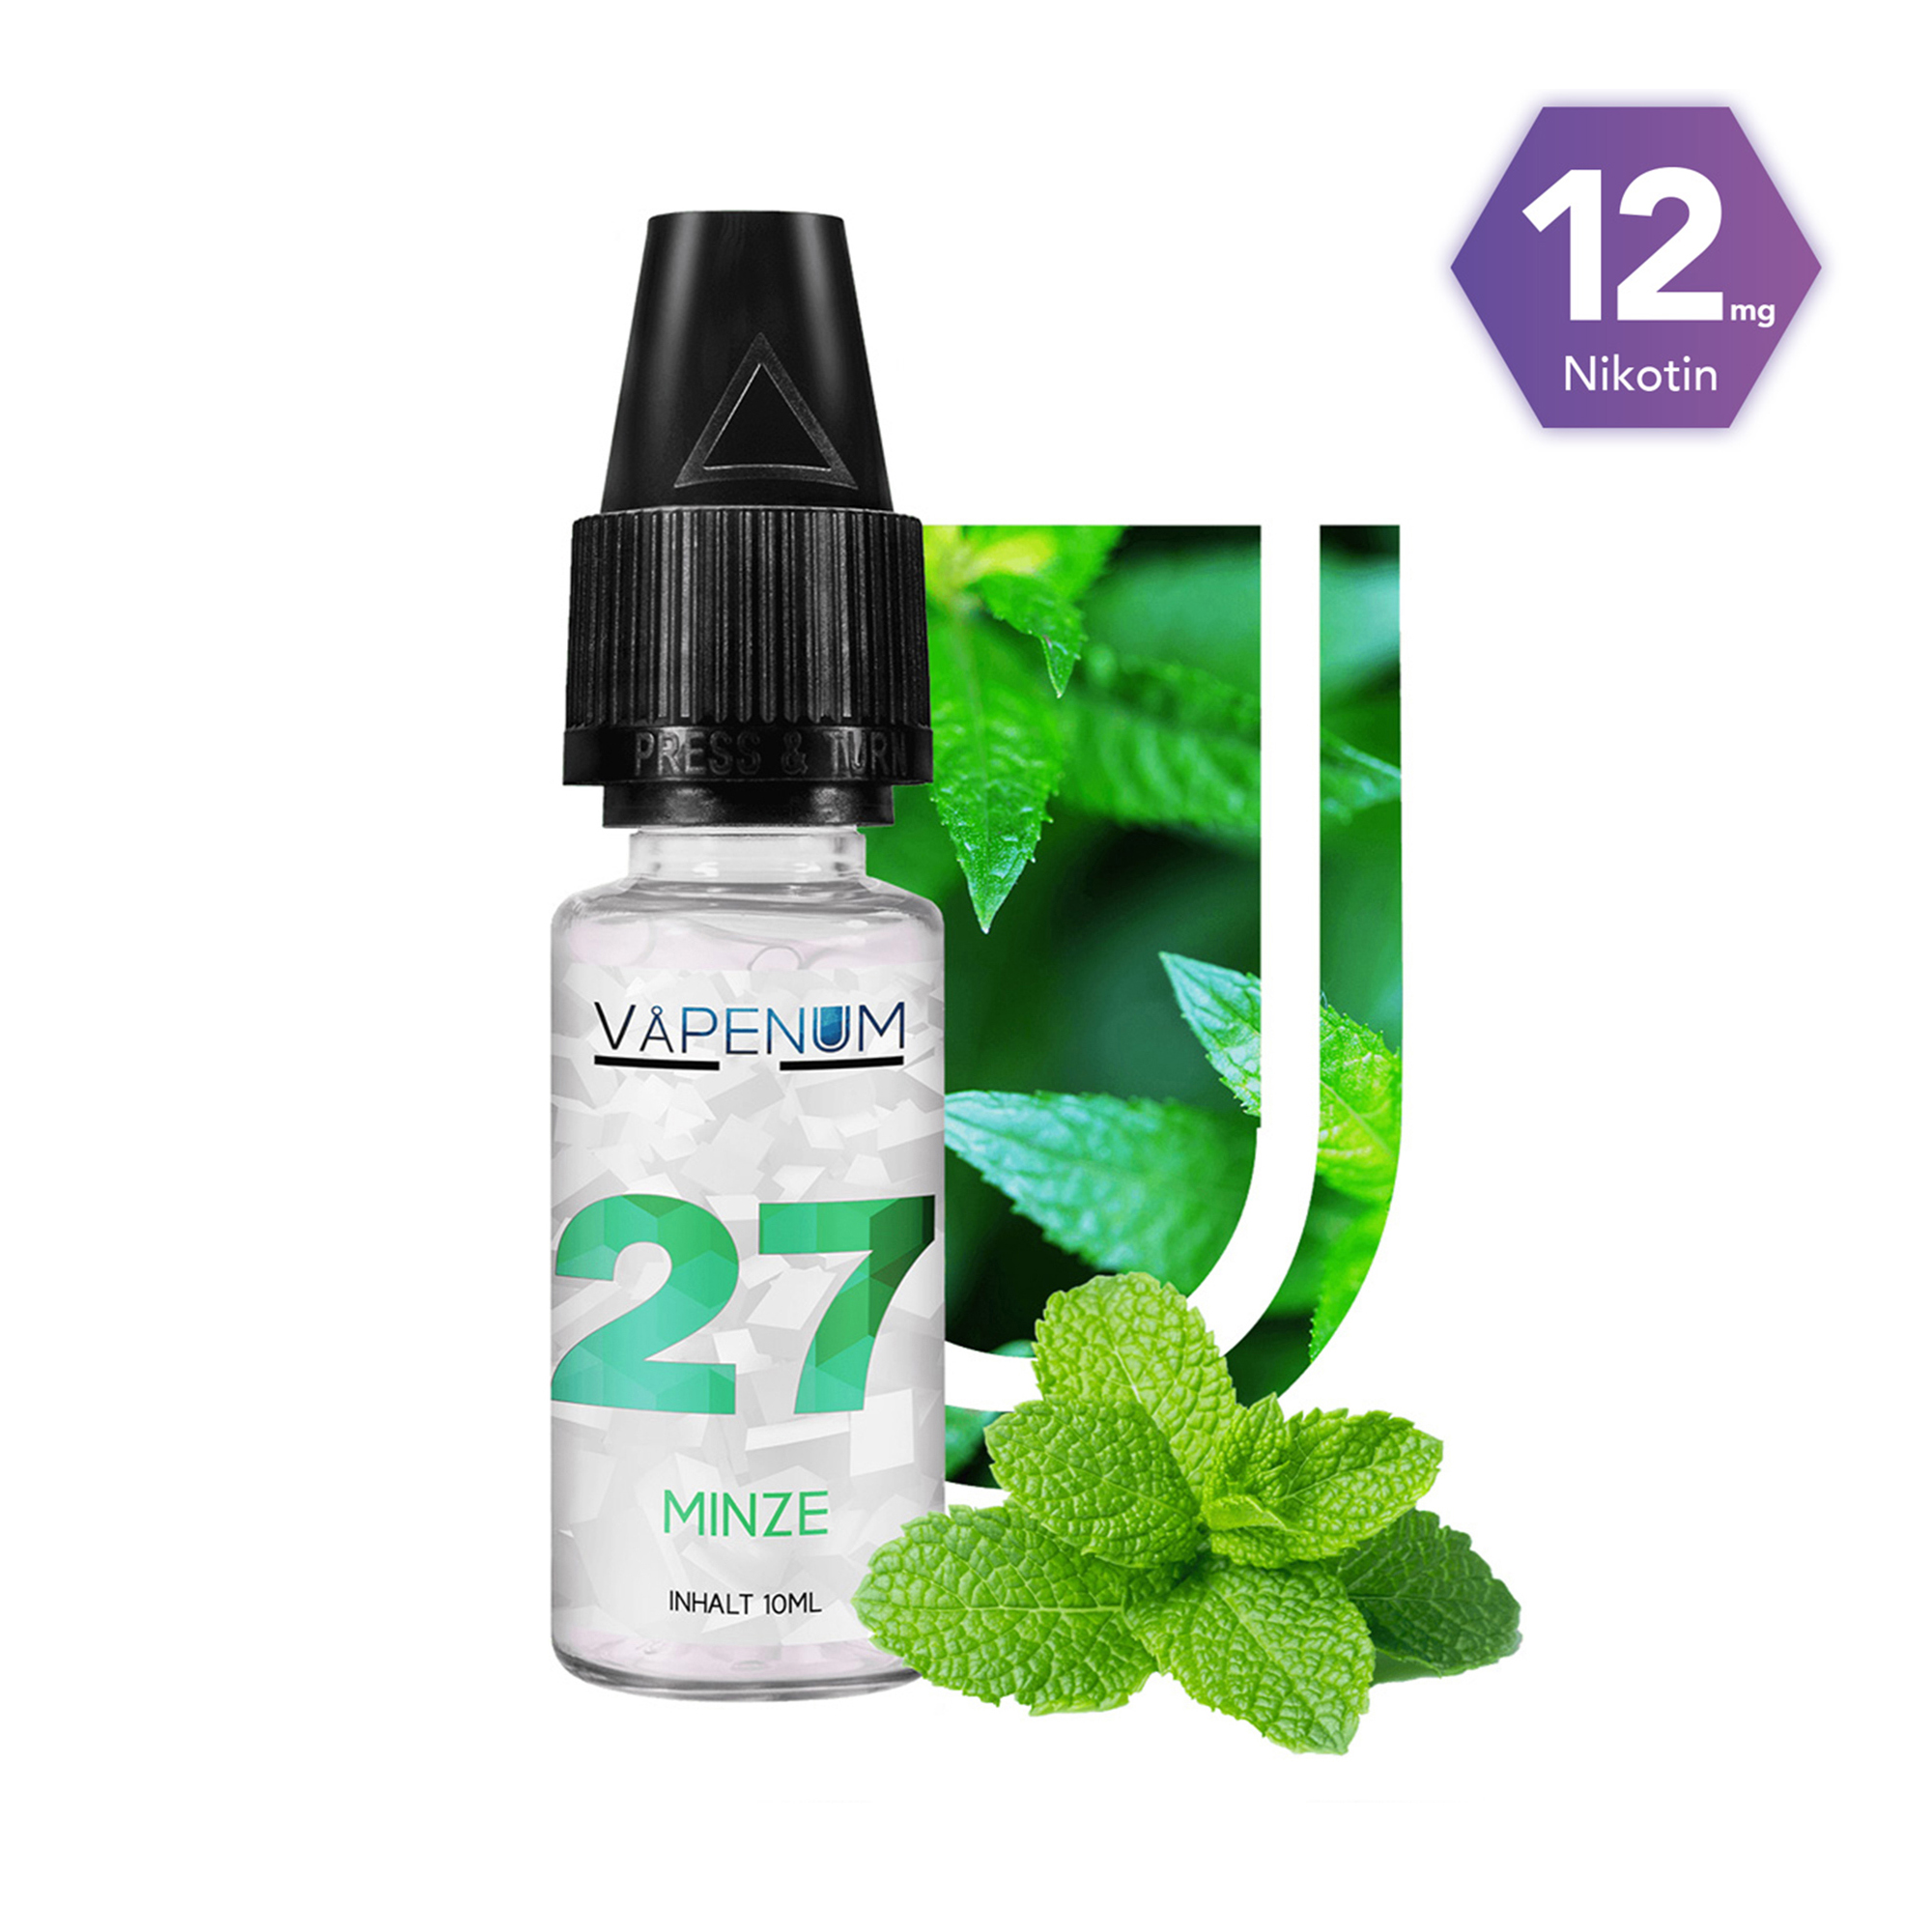 27 - Minze Liquid by Vapenum